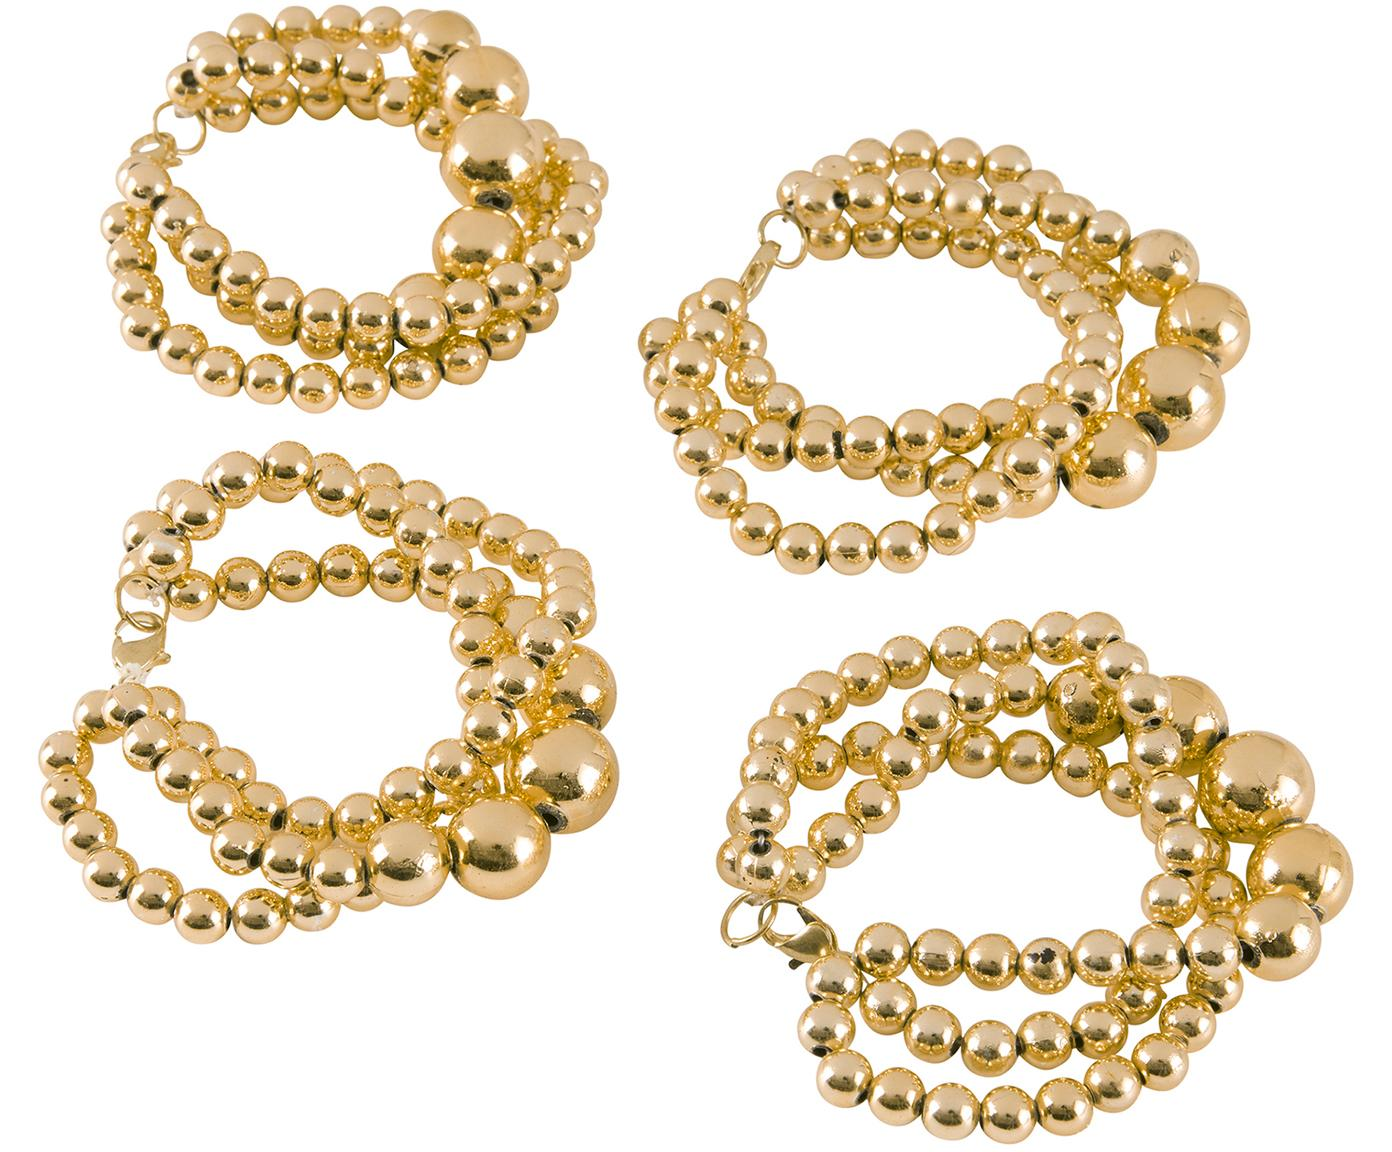 Serviettenringe Perla, 4 Stück, Kunststoff, Goldfarben, L 15 cm